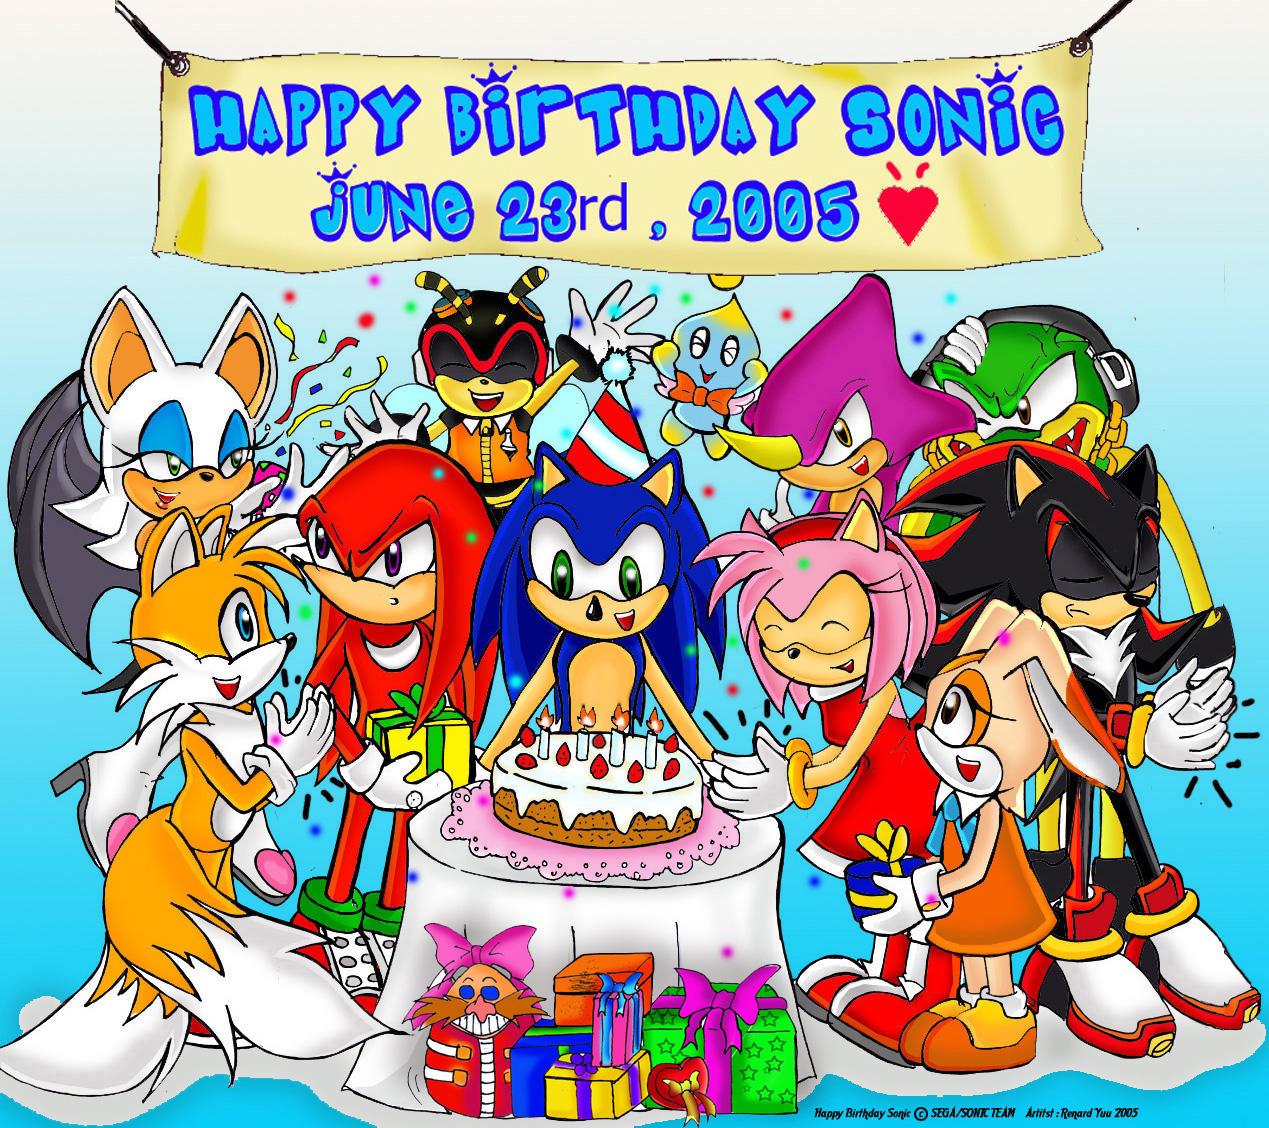 Happy Birthday Sonic By Renard1 On DeviantArt